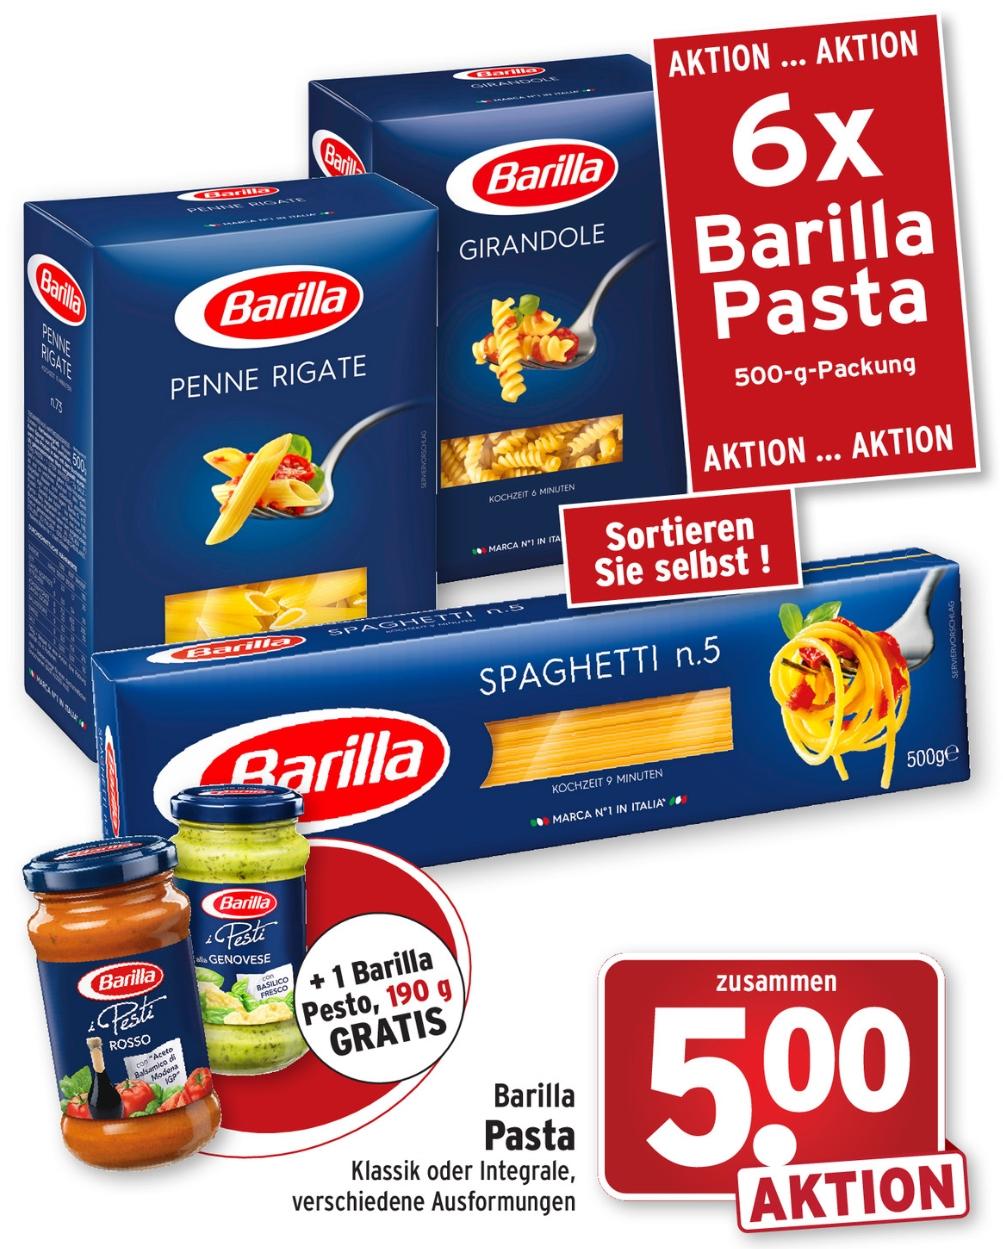 [Wasgau] 6 Packungen Barilla 500g Pasta + 1 Barilla Pesto Glas